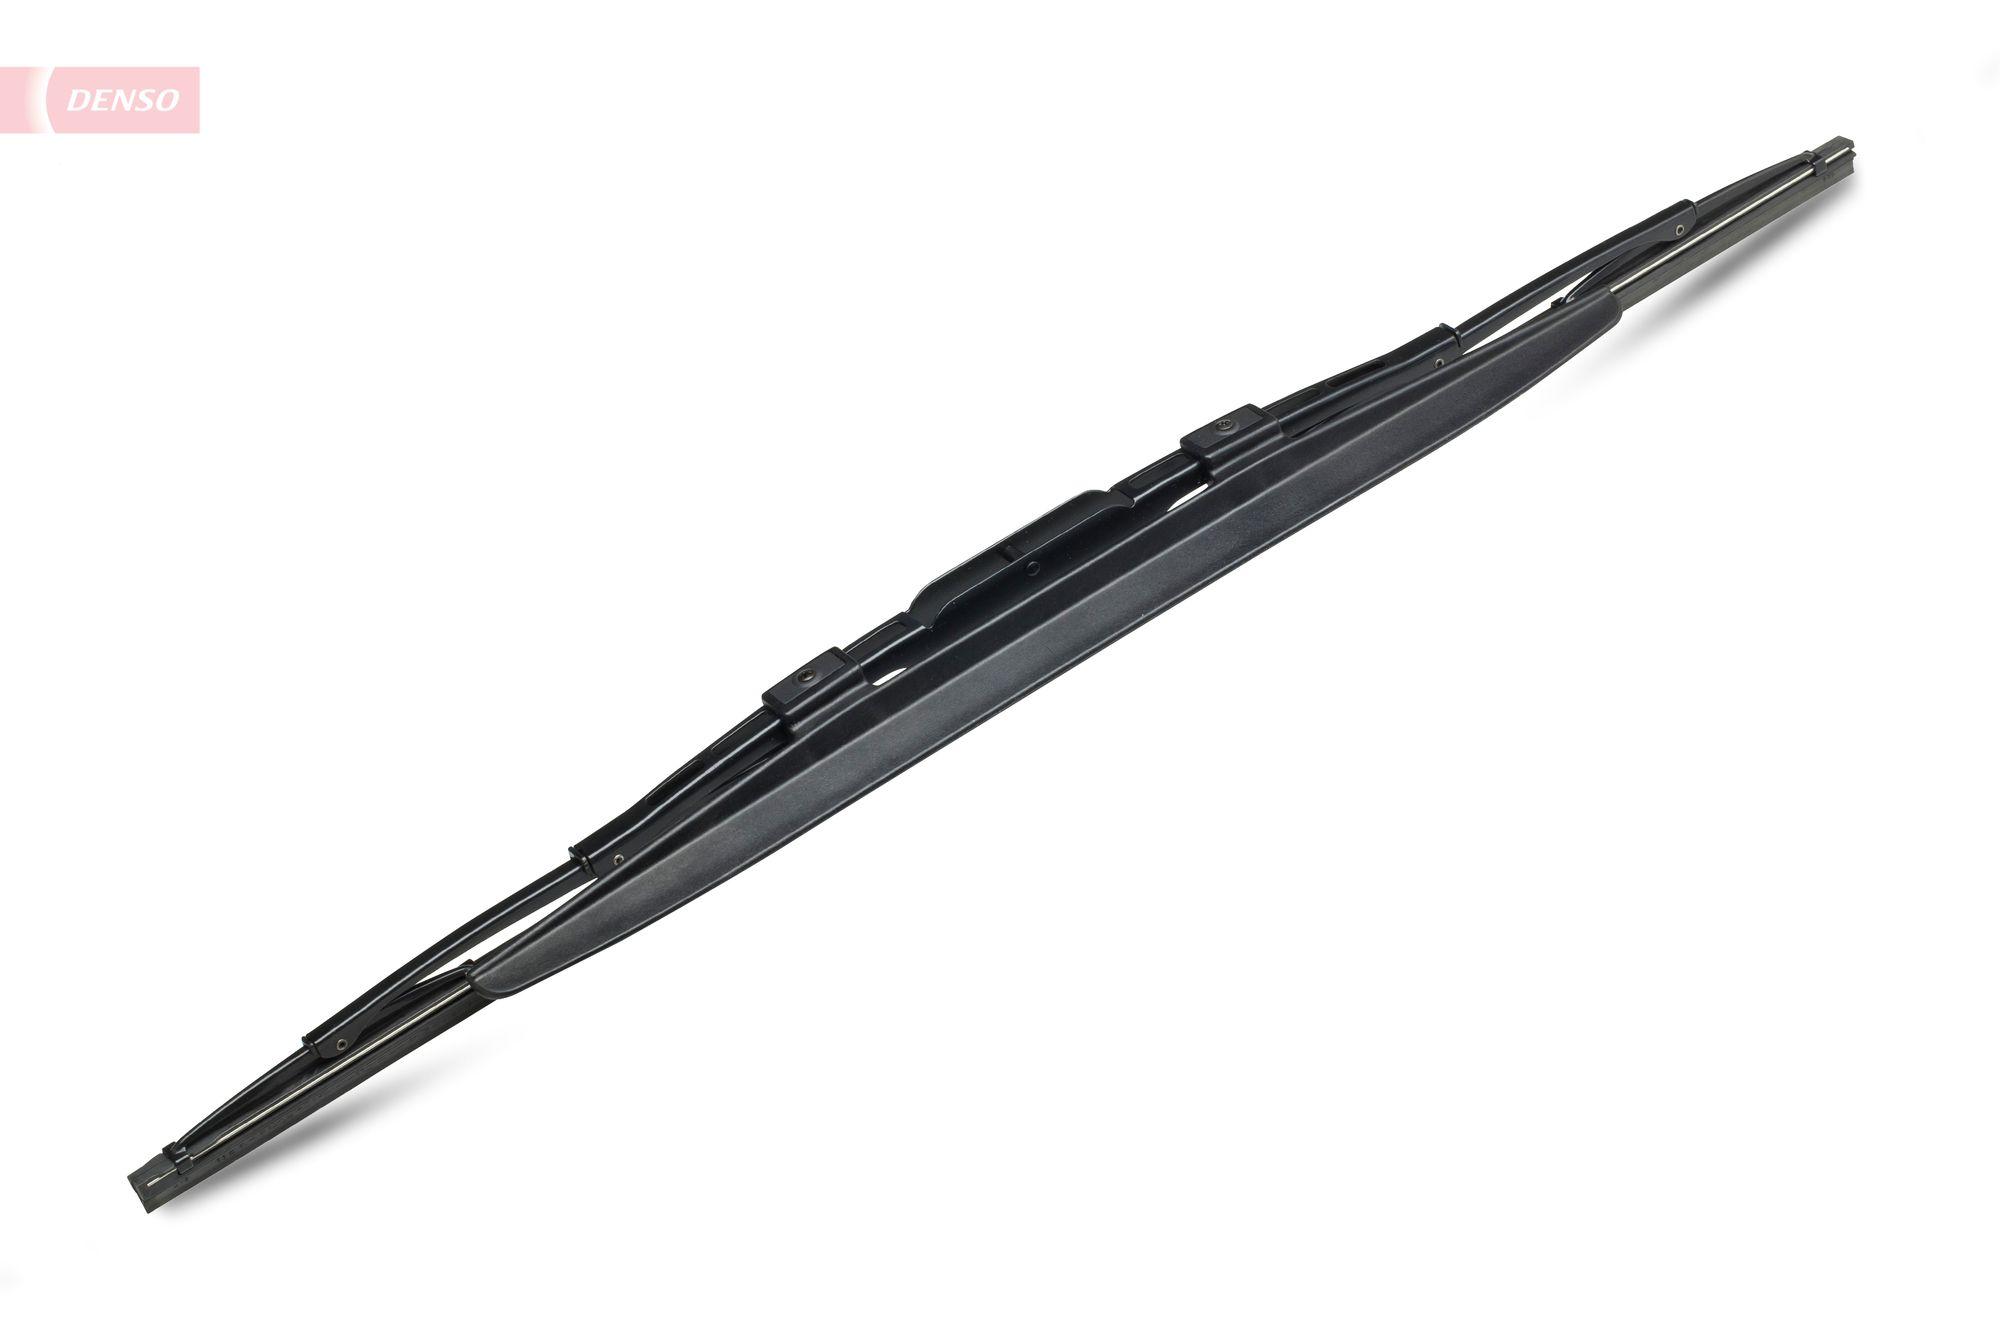 DENSO Standard Spoiler DMS-565 Wischblatt